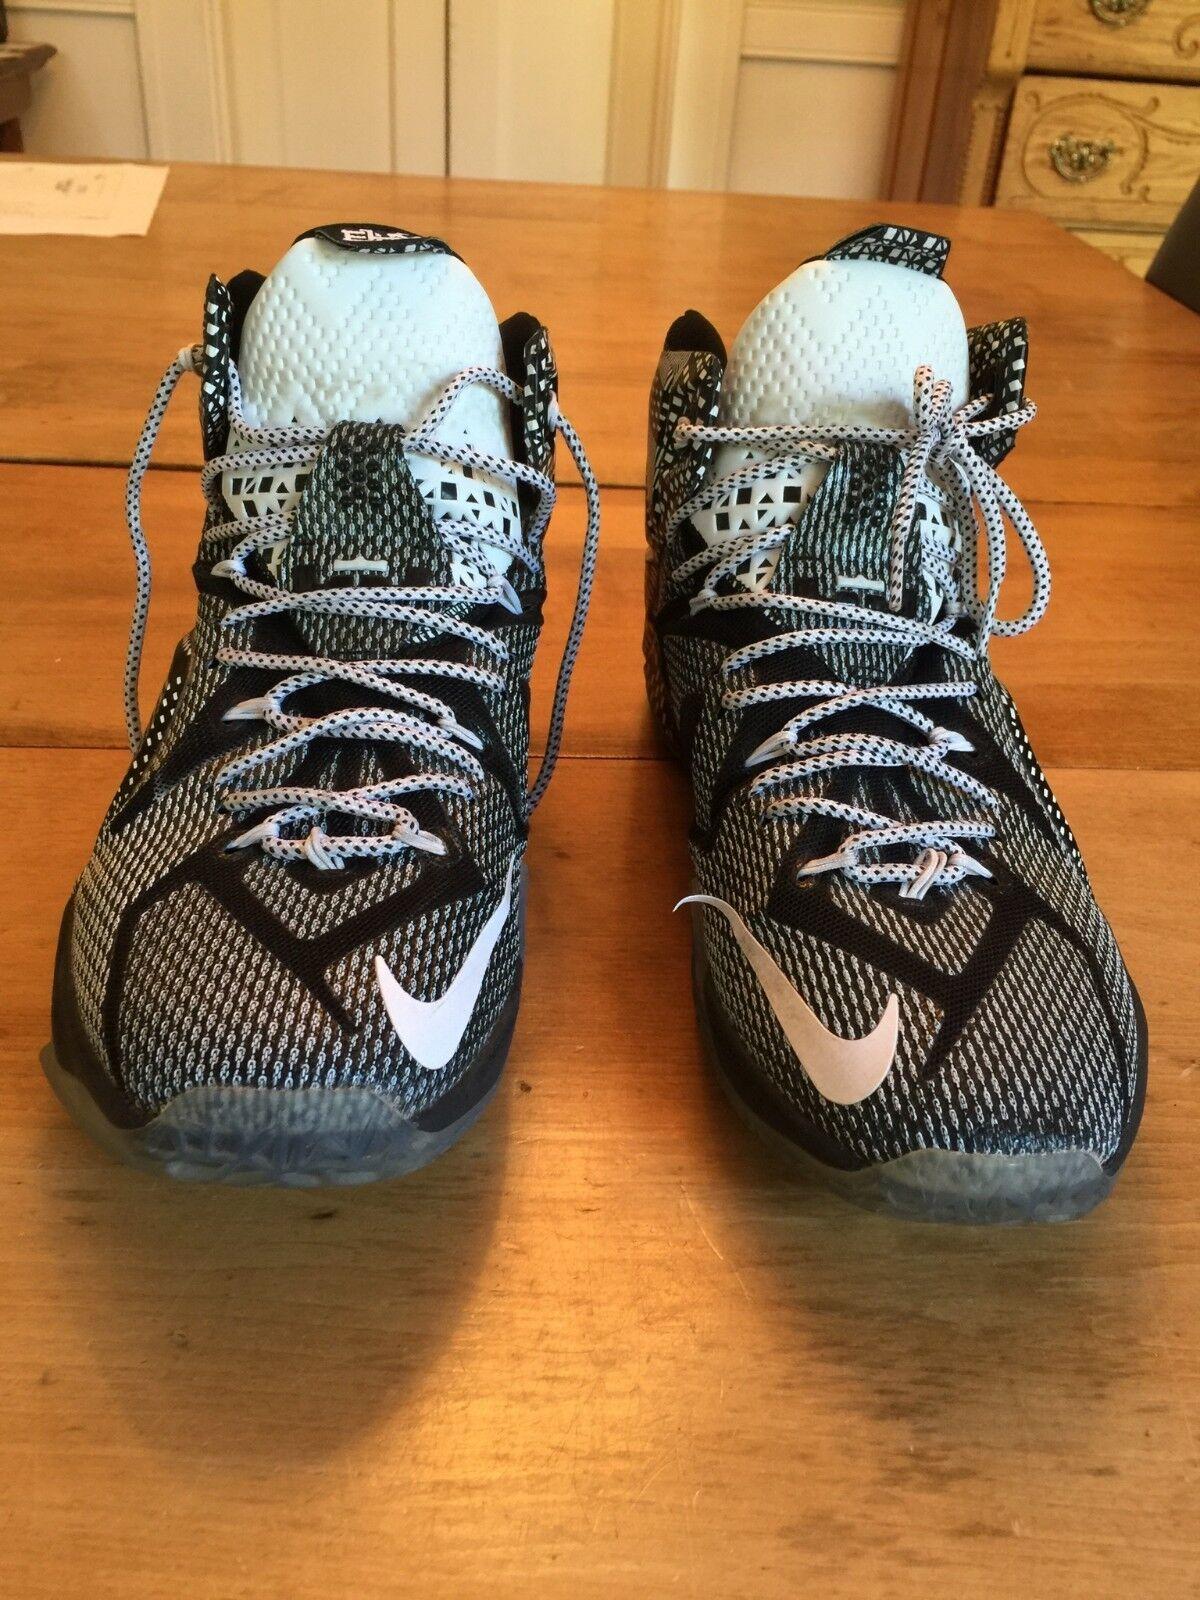 Details about Nike SB Air Max Bruin Vapor Black. Men's Shoes. BlackCool Grey Wht.(NO BOX LID)